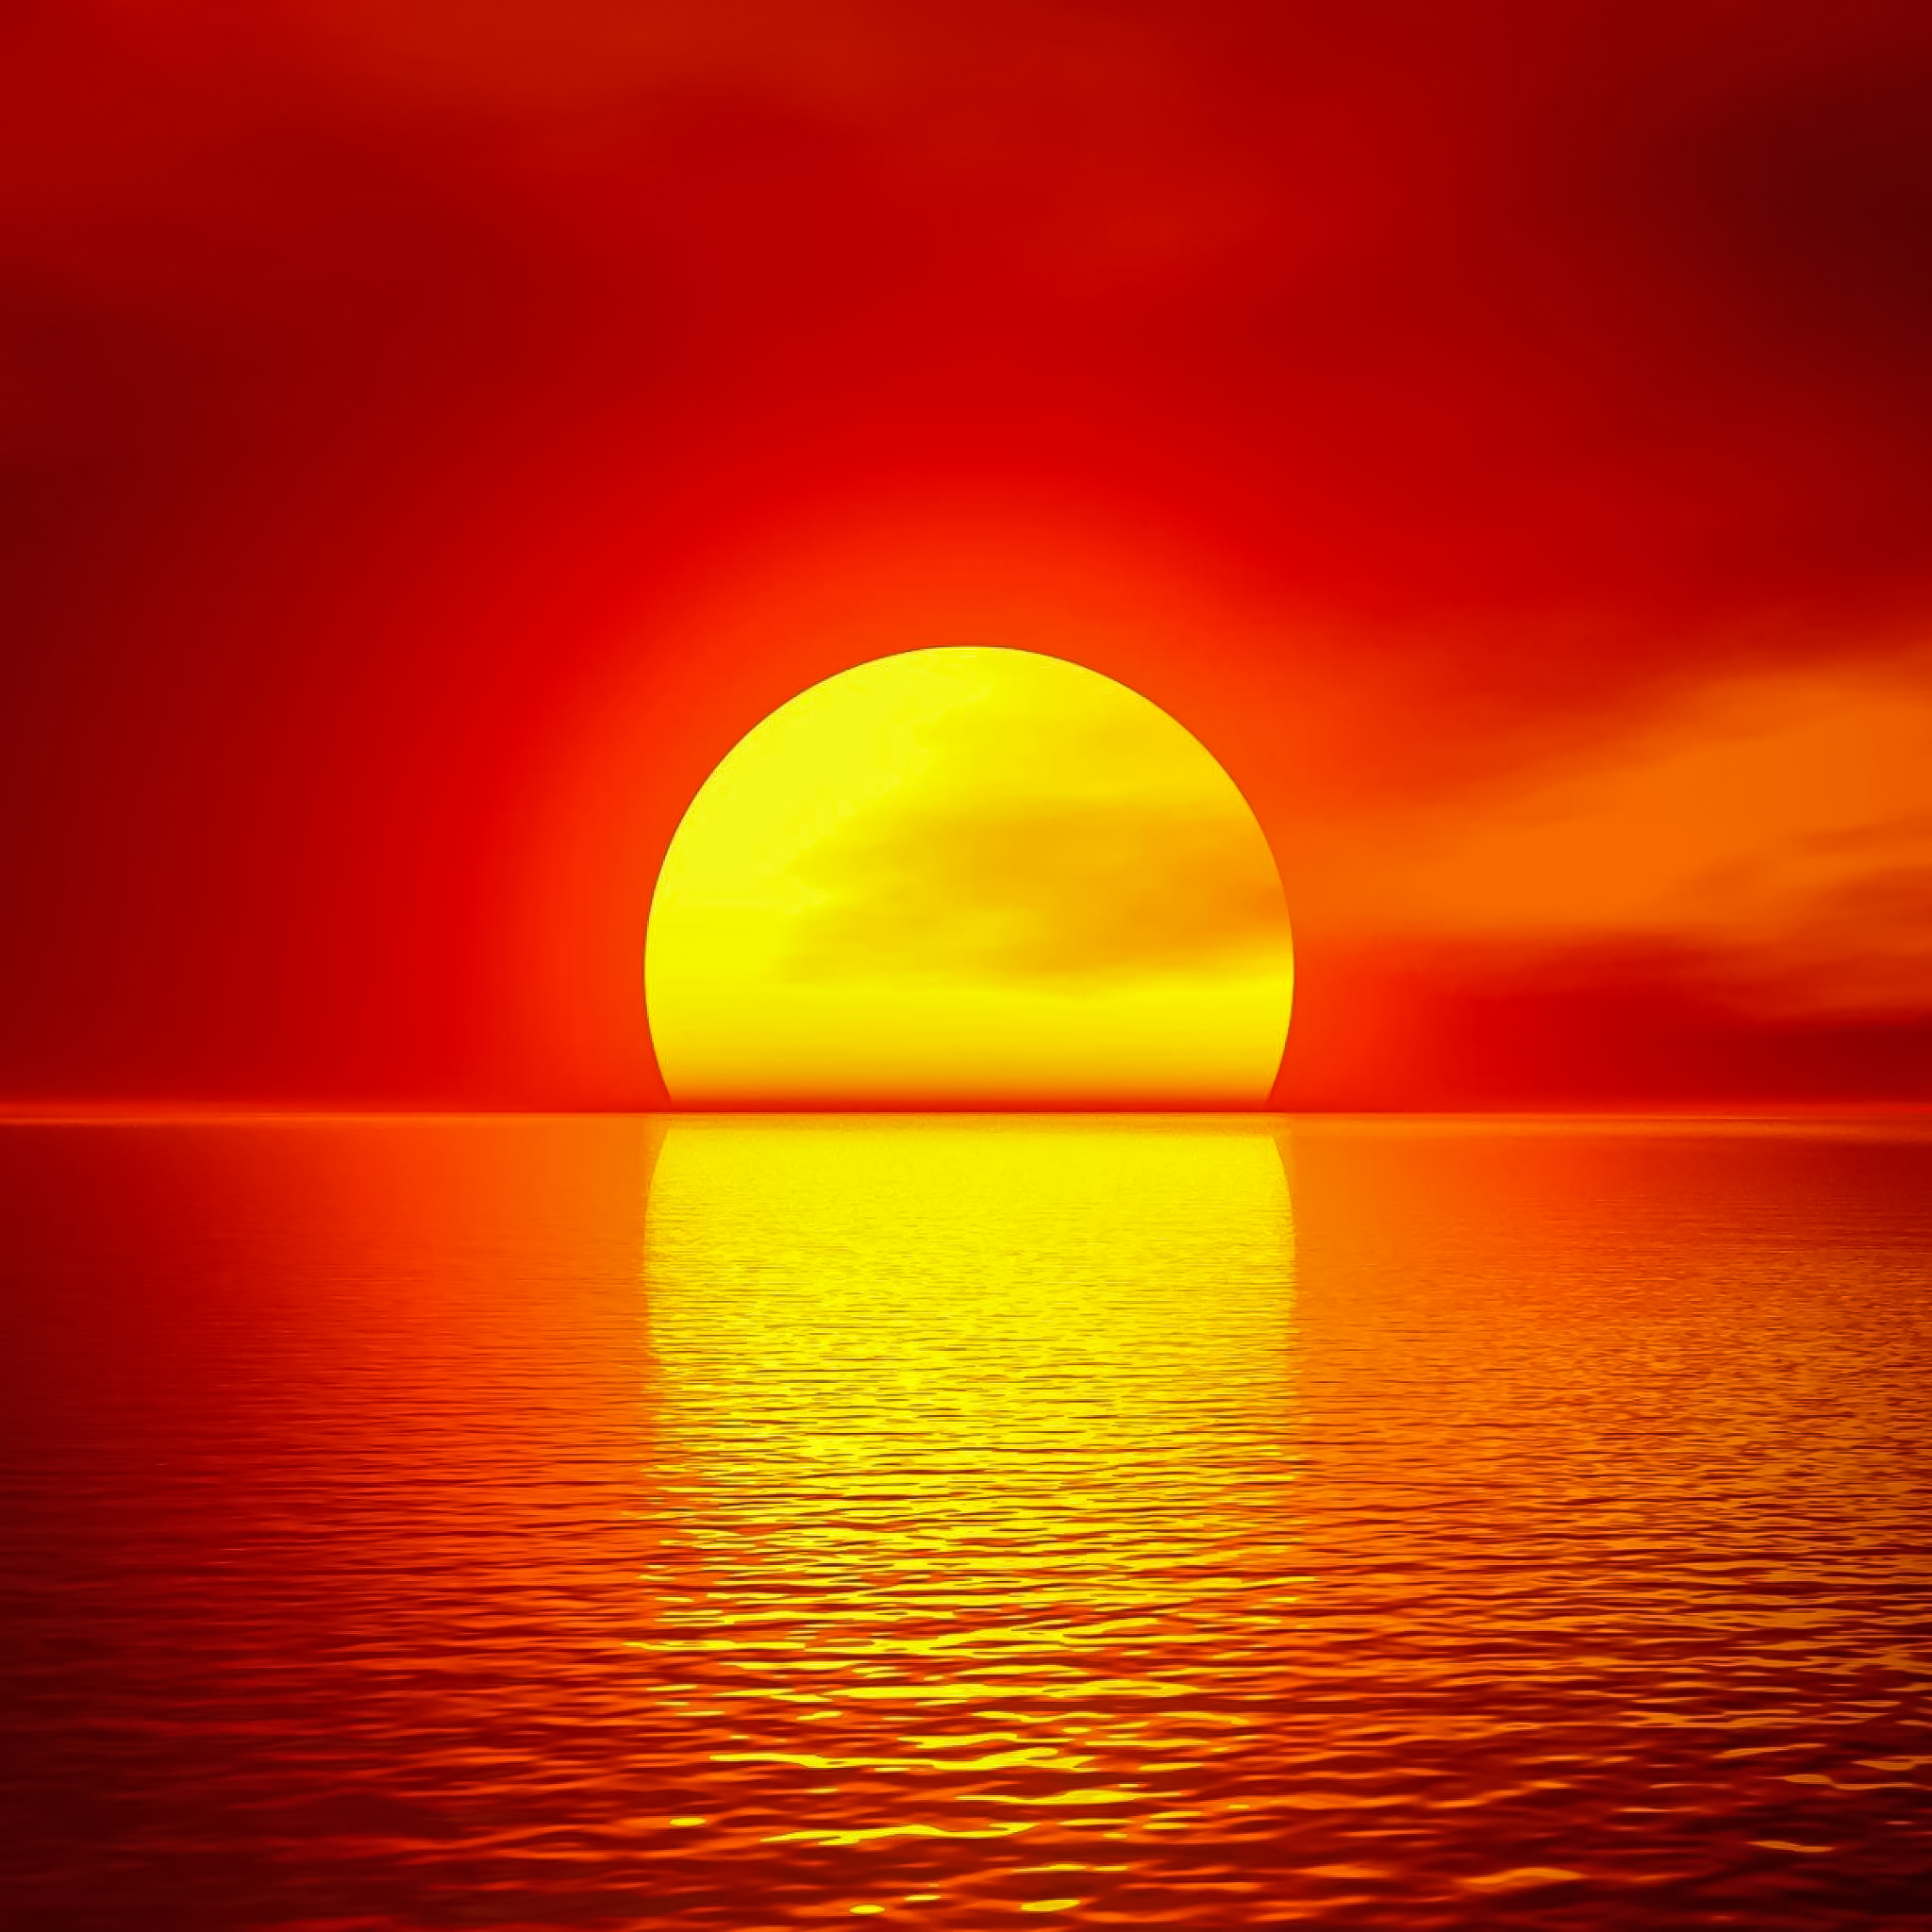 ★ Fiery Sunset by @RetinaiPadWalls on twitter.jpg